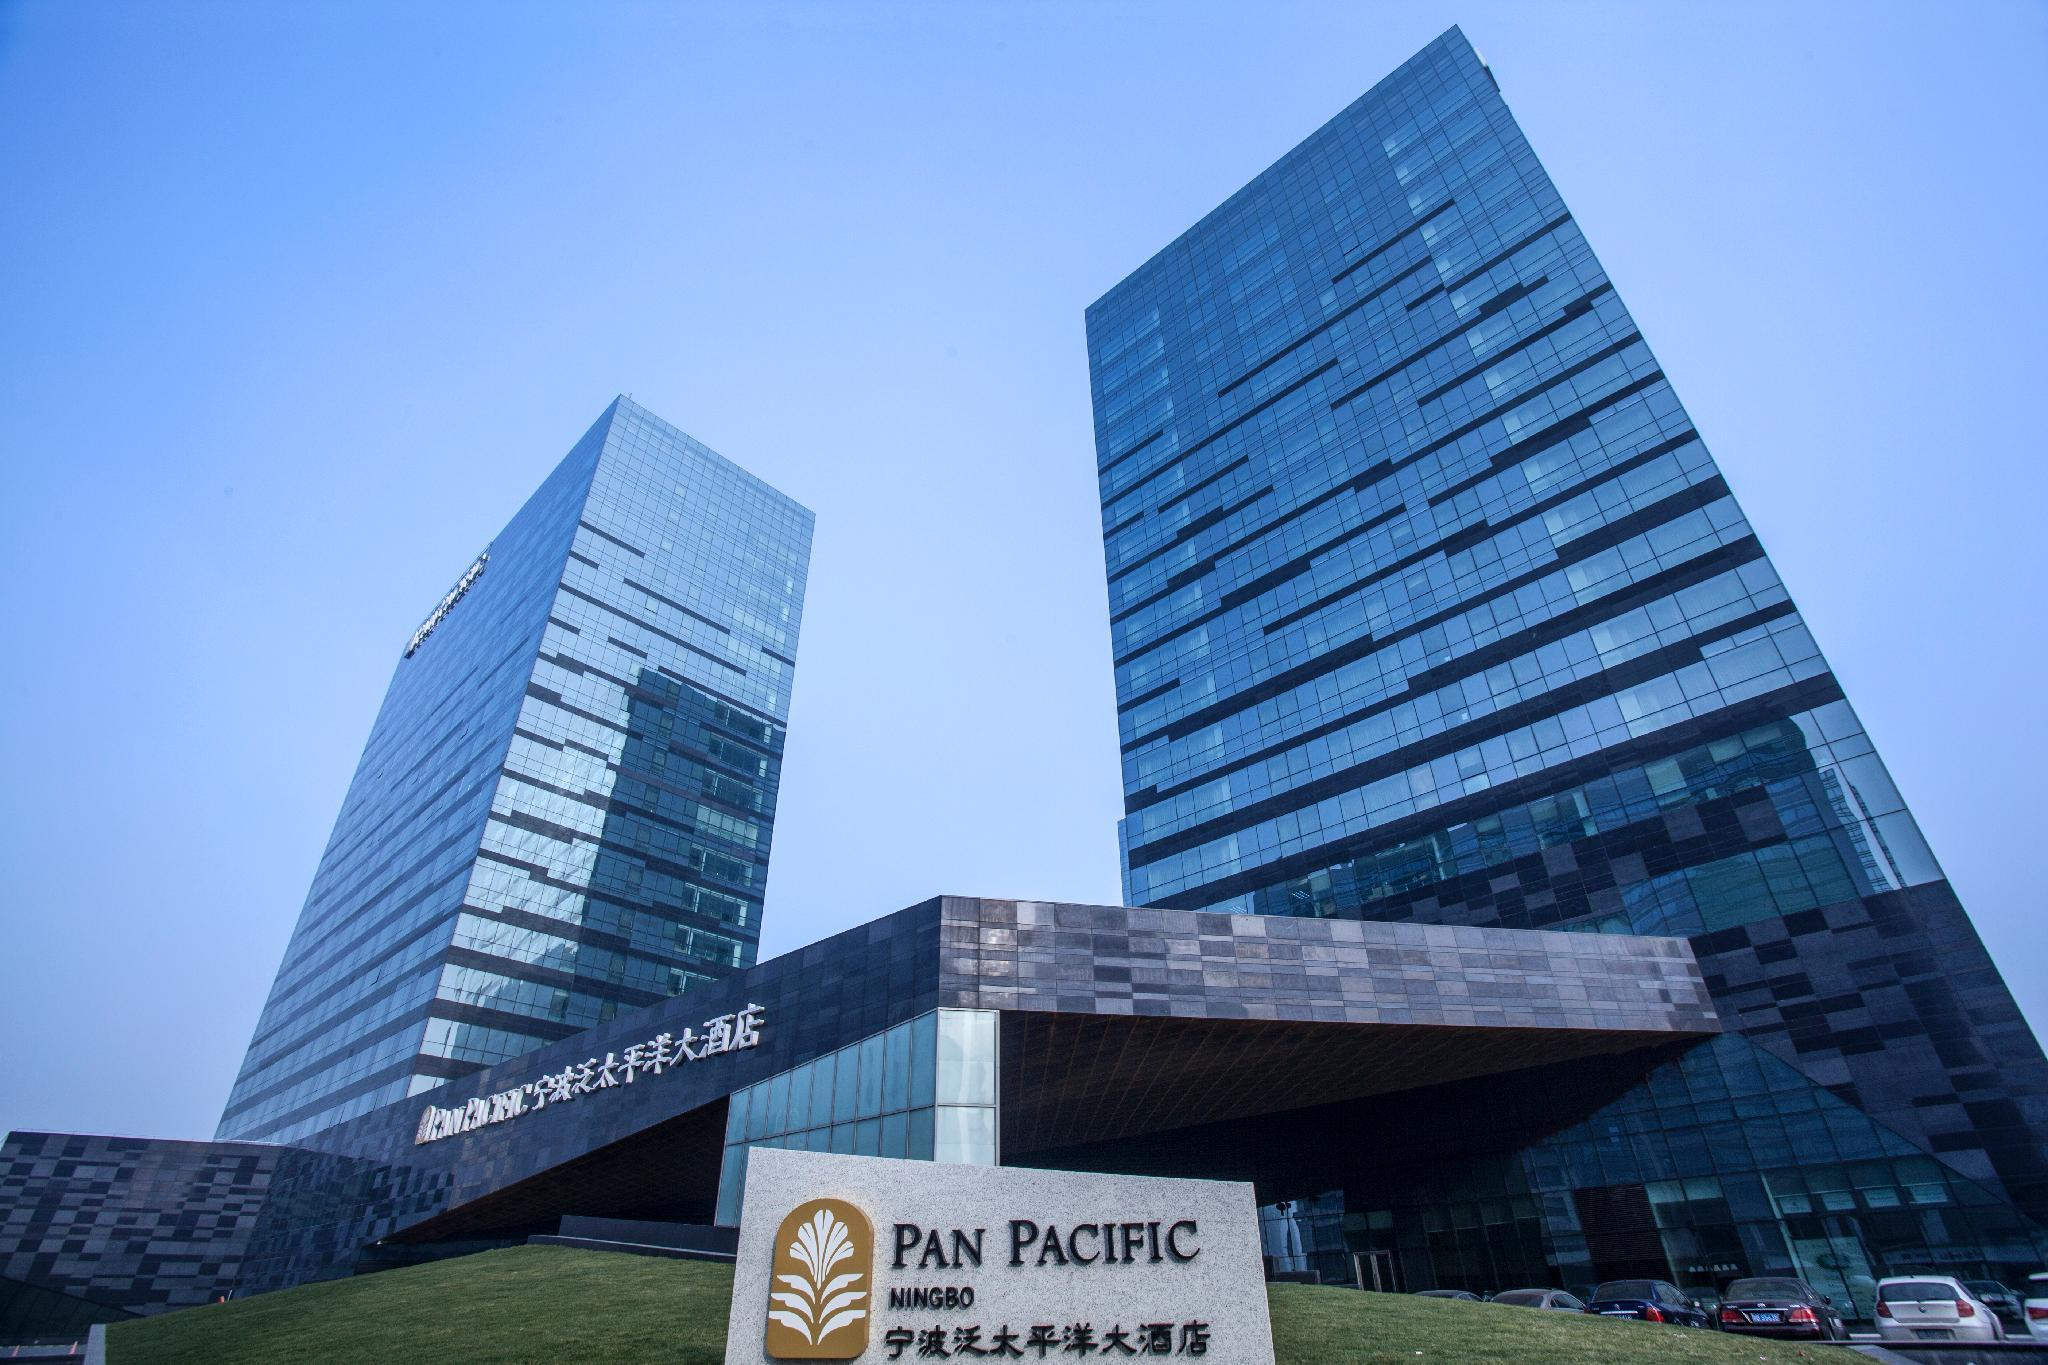 Pan Pacific Ningbo Hotel